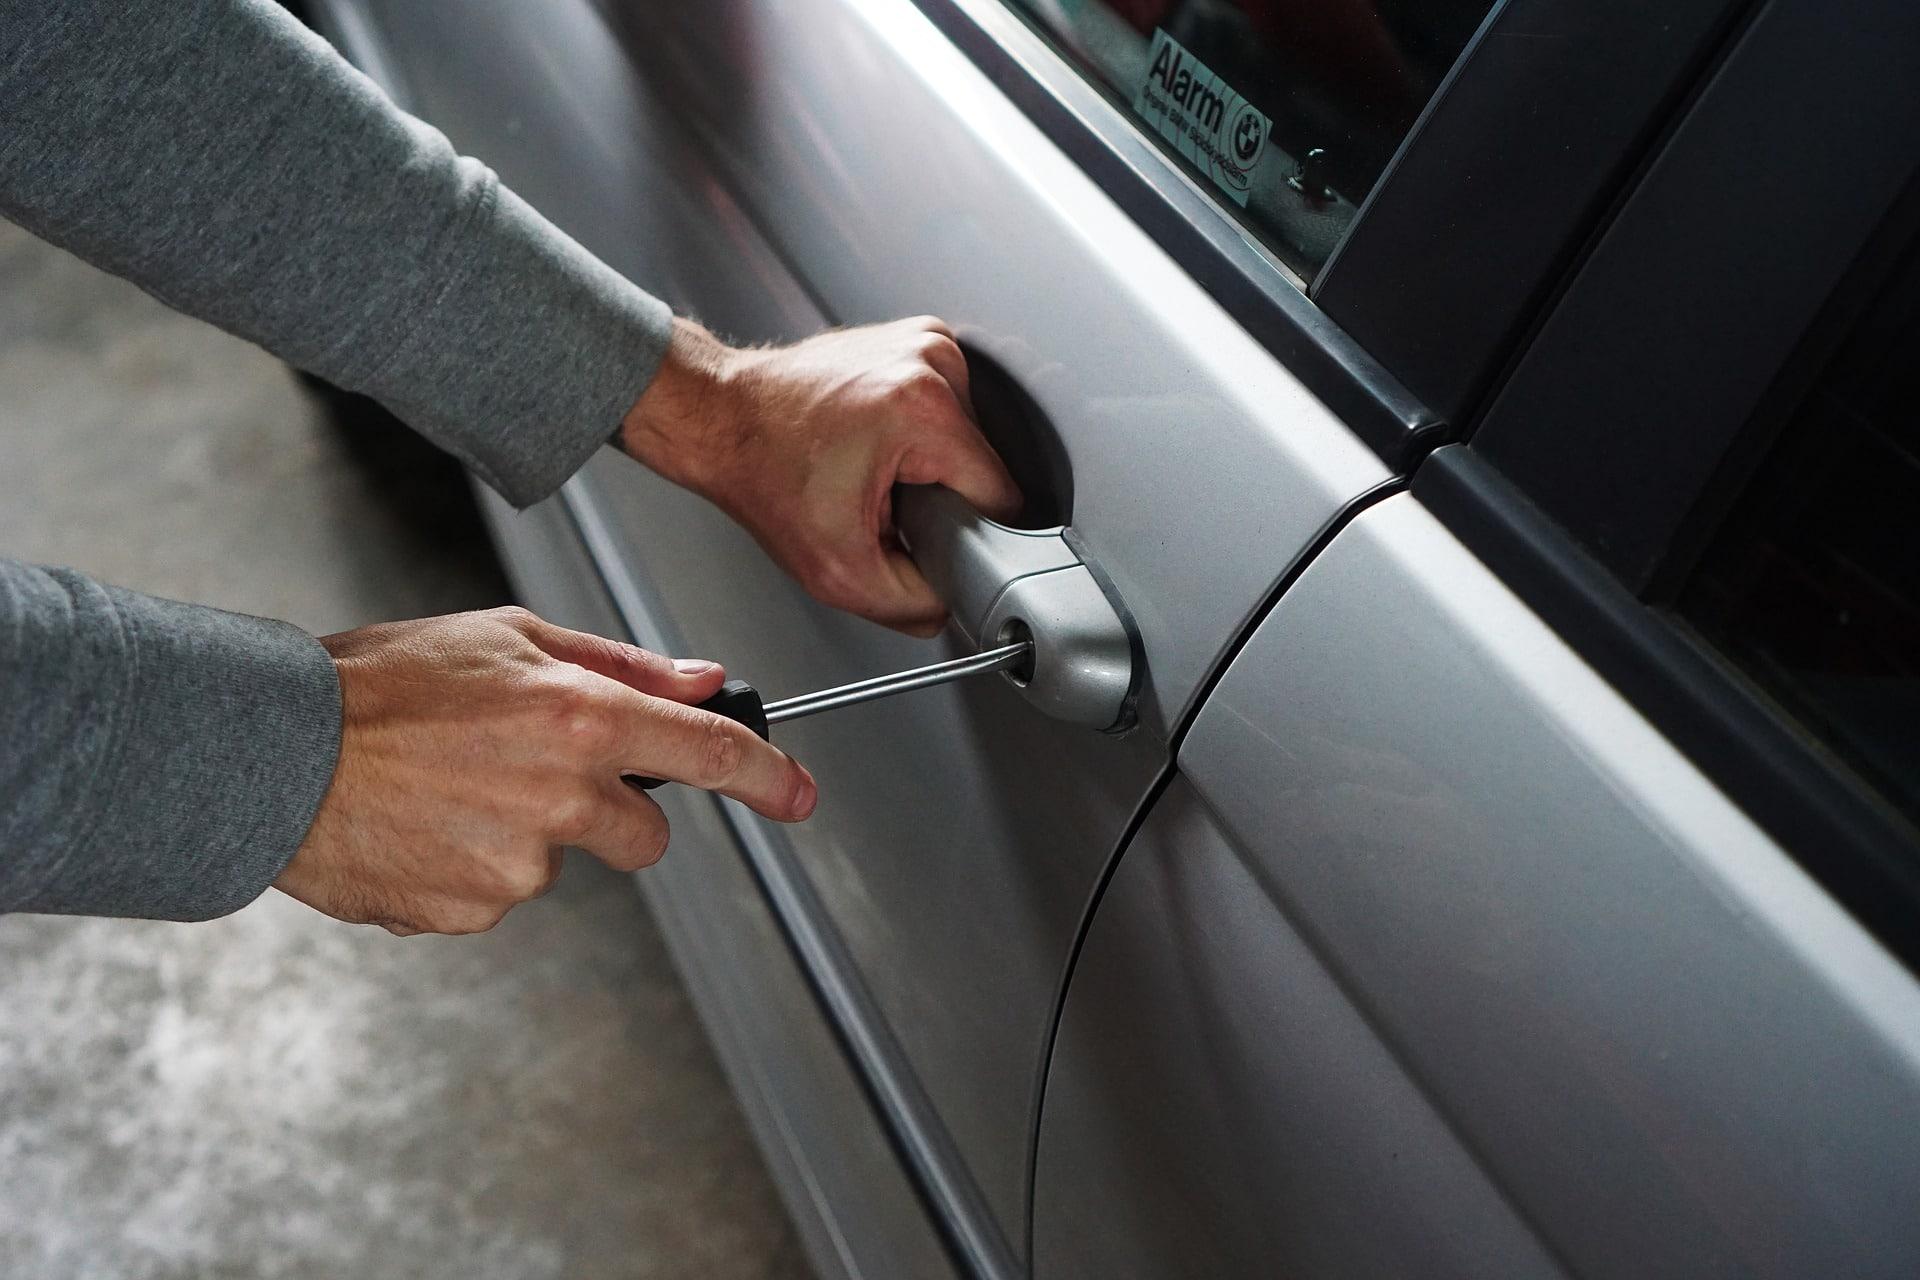 Car Lockout Services In Santa Ana